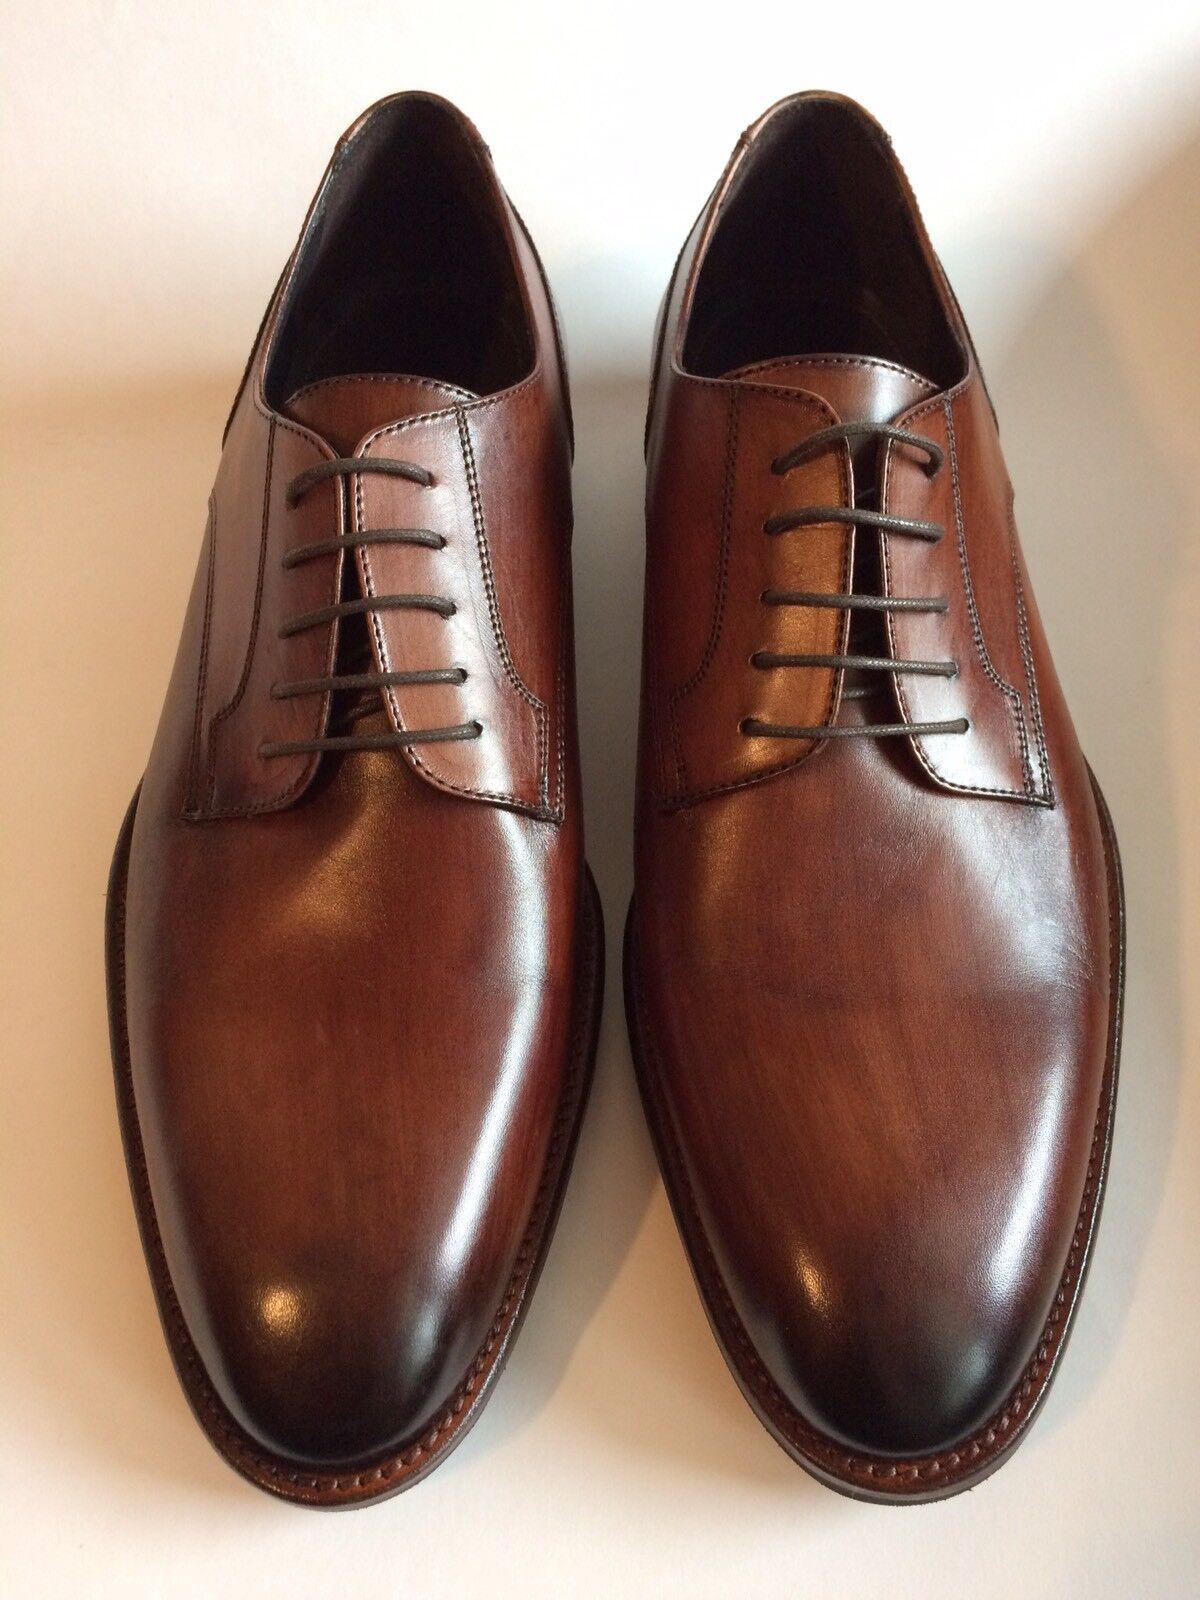 JOHNSTON & MURPHY Made In ITALY Oxfords Dress Scarpe Plain Toe marrone US Taglia 10 D